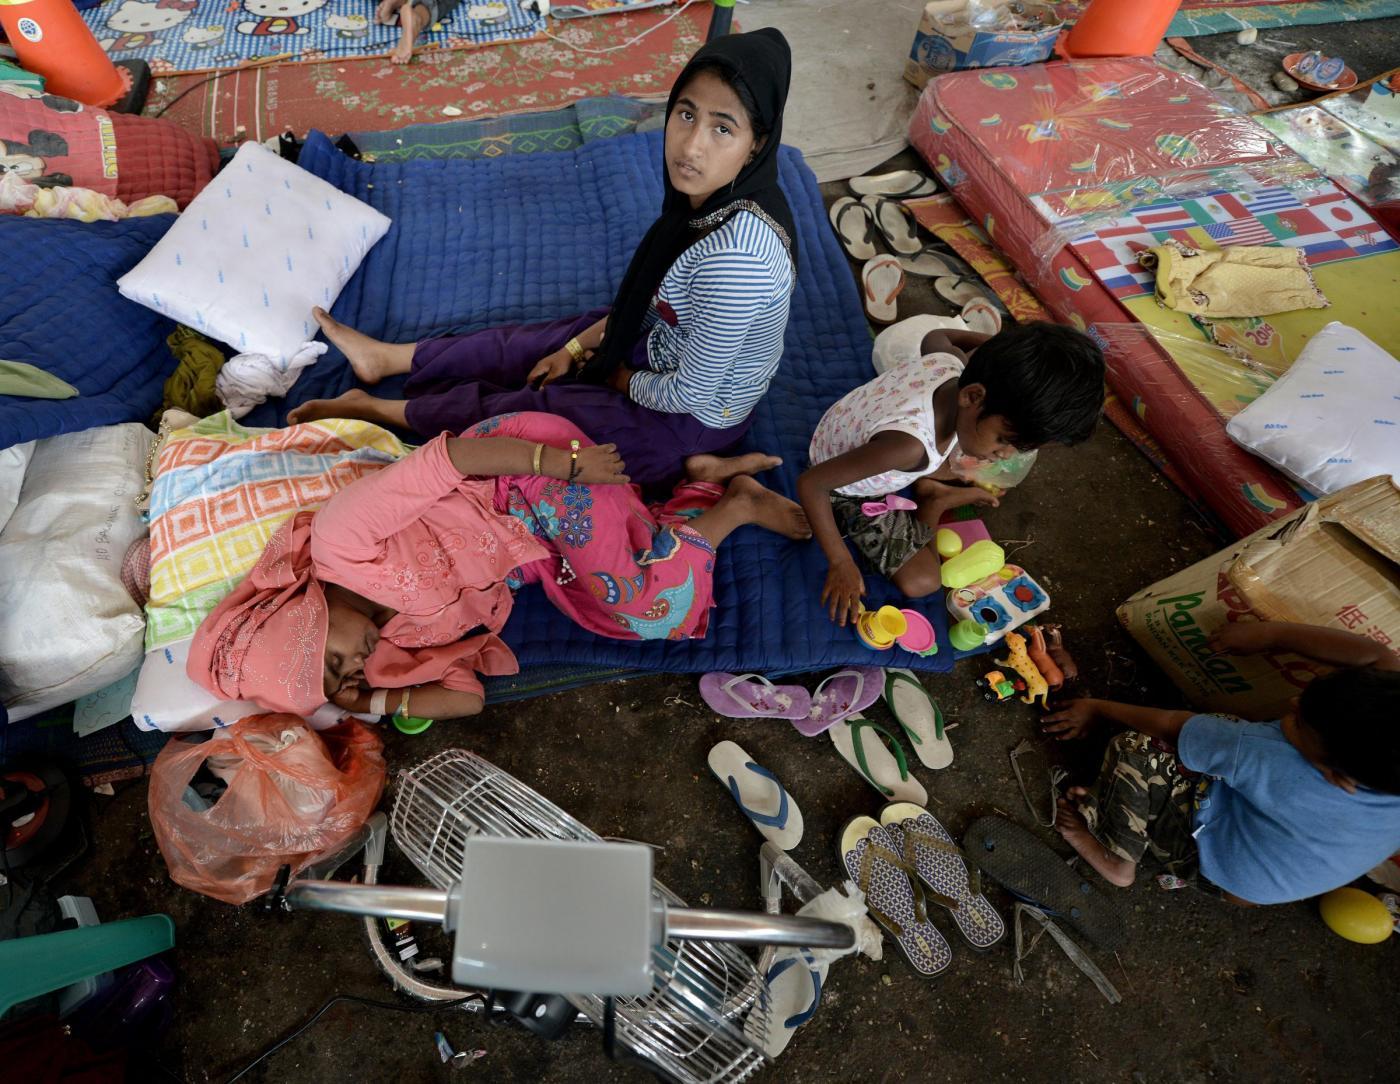 Indonesia rifugiati in attesa di aiuti umanitari